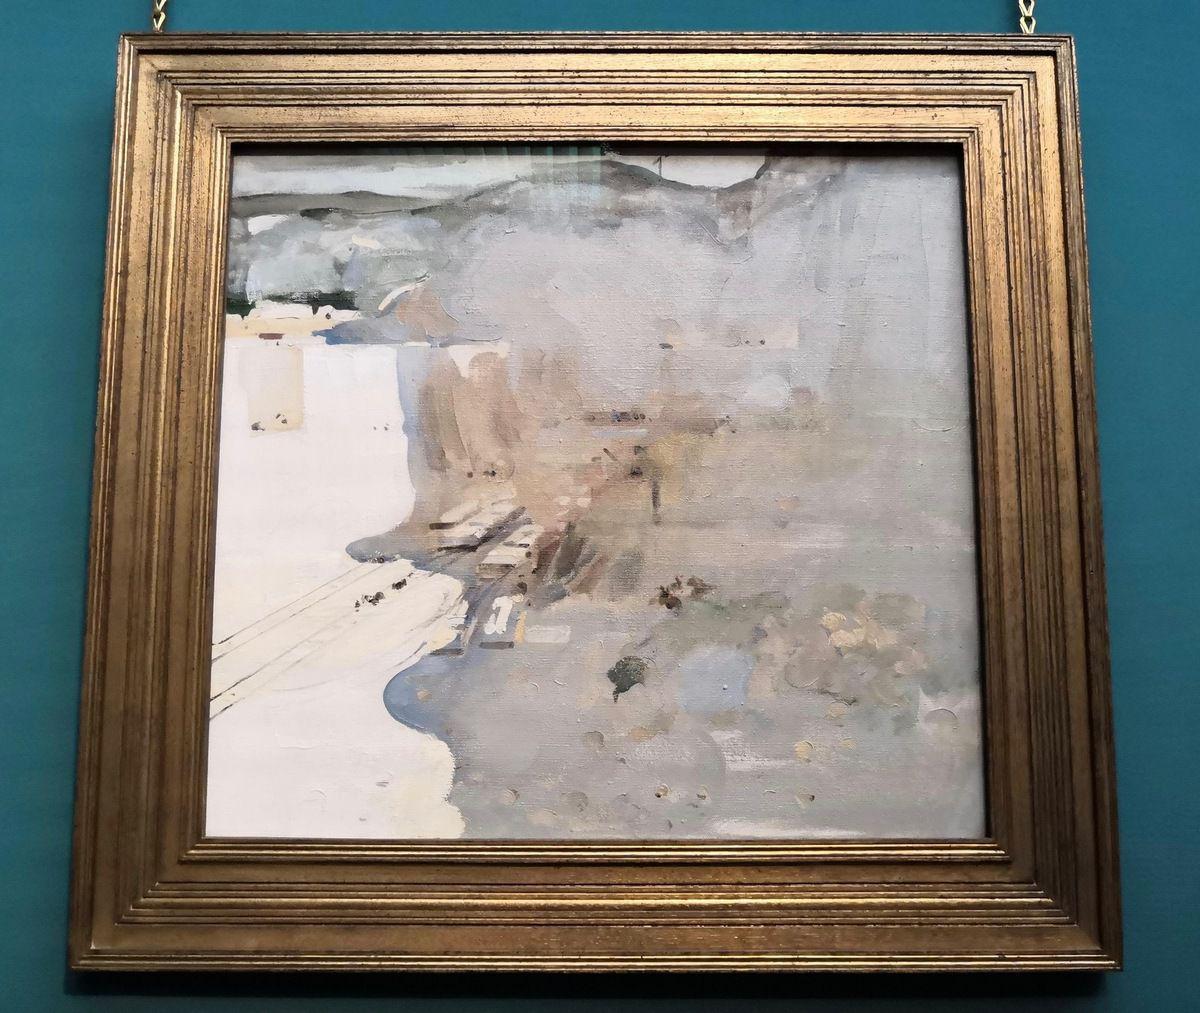 Arthur Melville (1855-1904), The Chalk Cutting, 1898